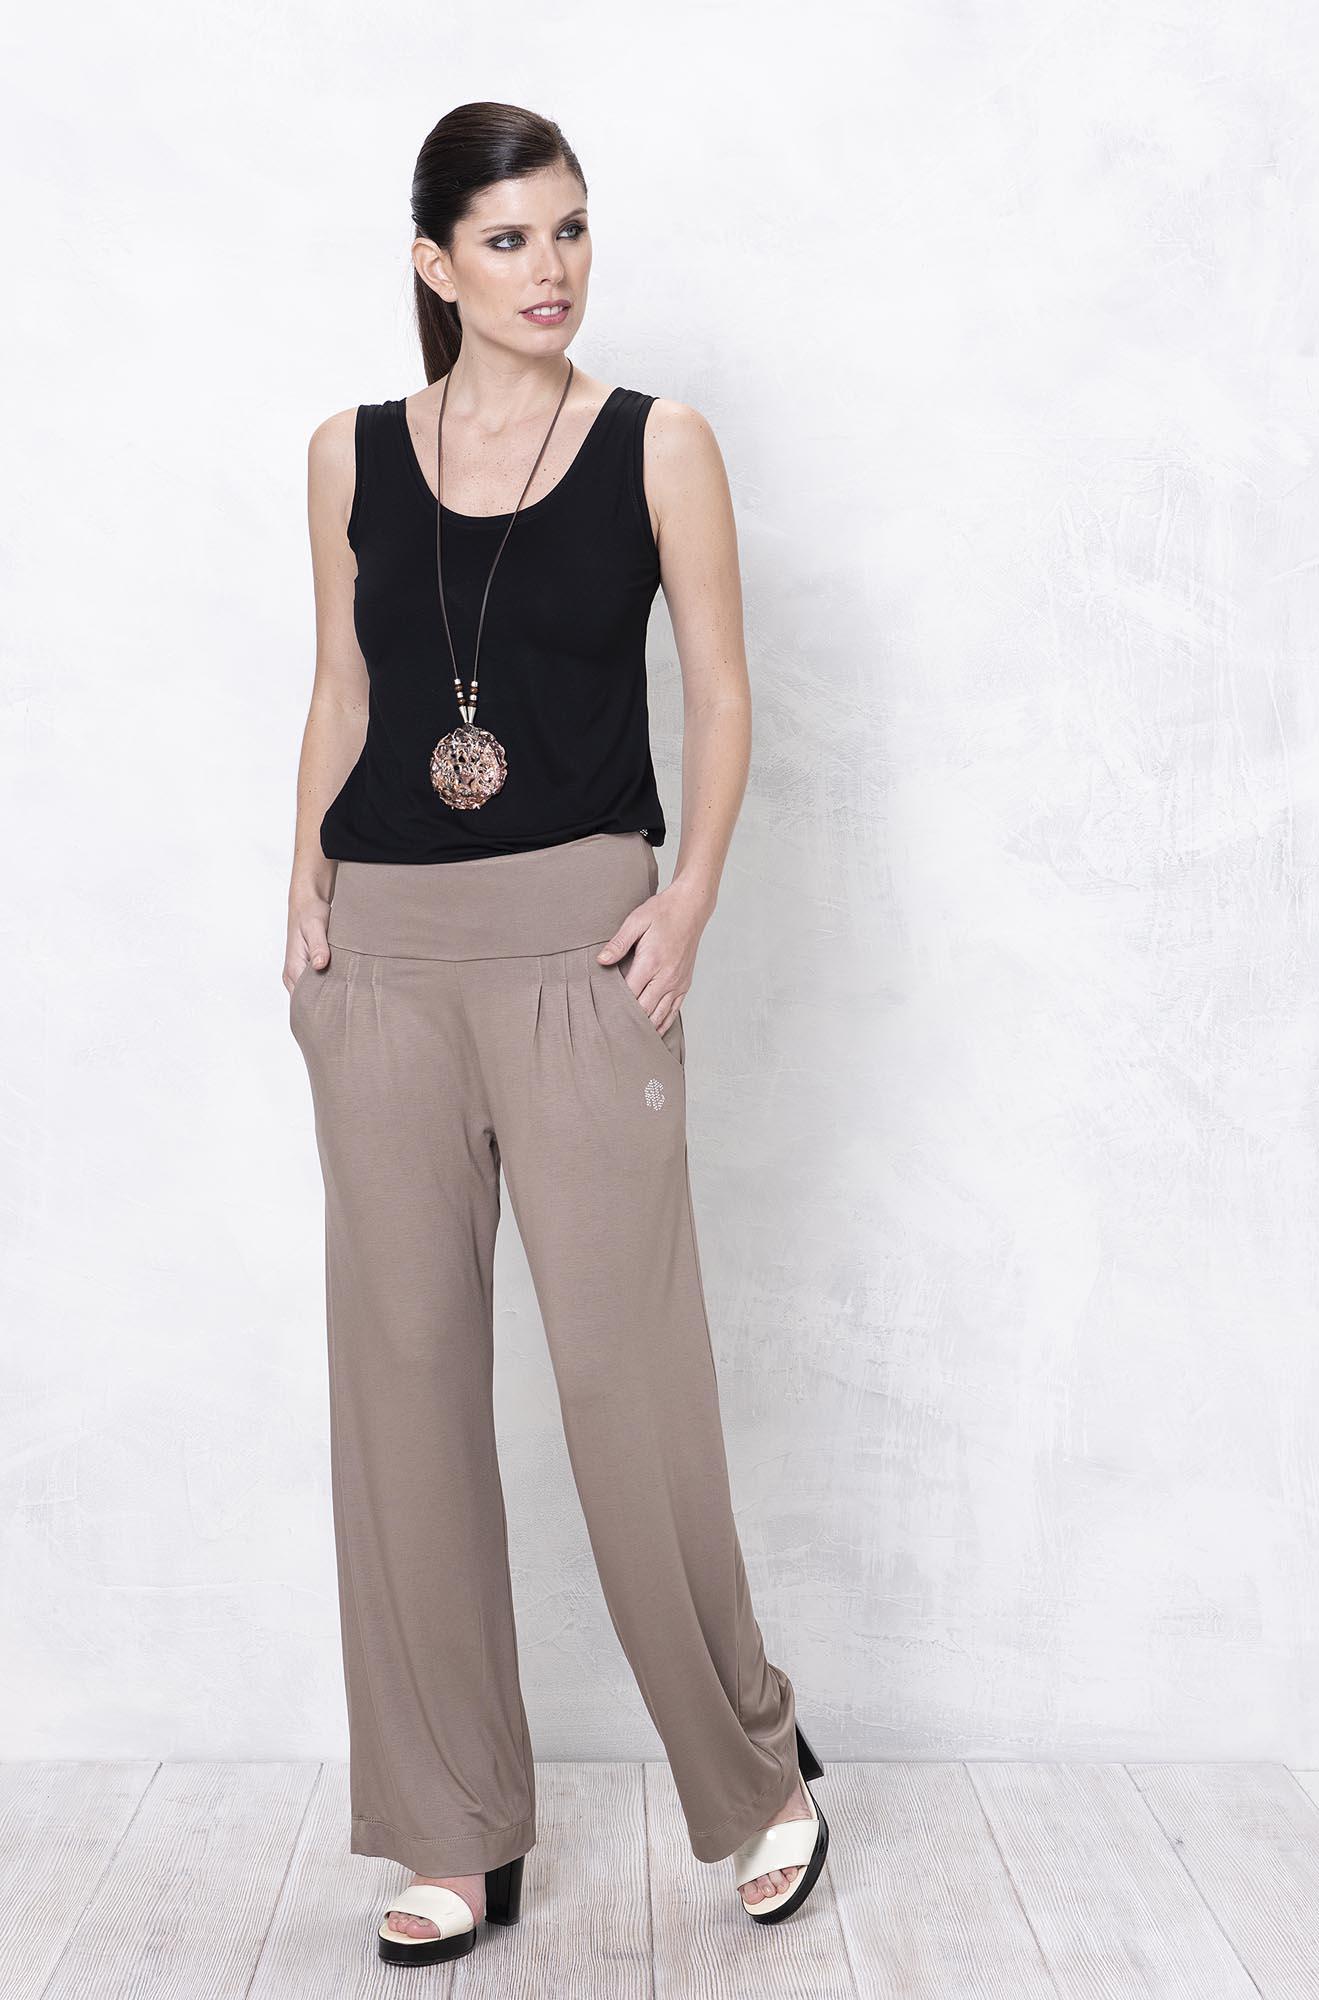 Pantalon Modal Adriana Costantini Primavera Verano 2021